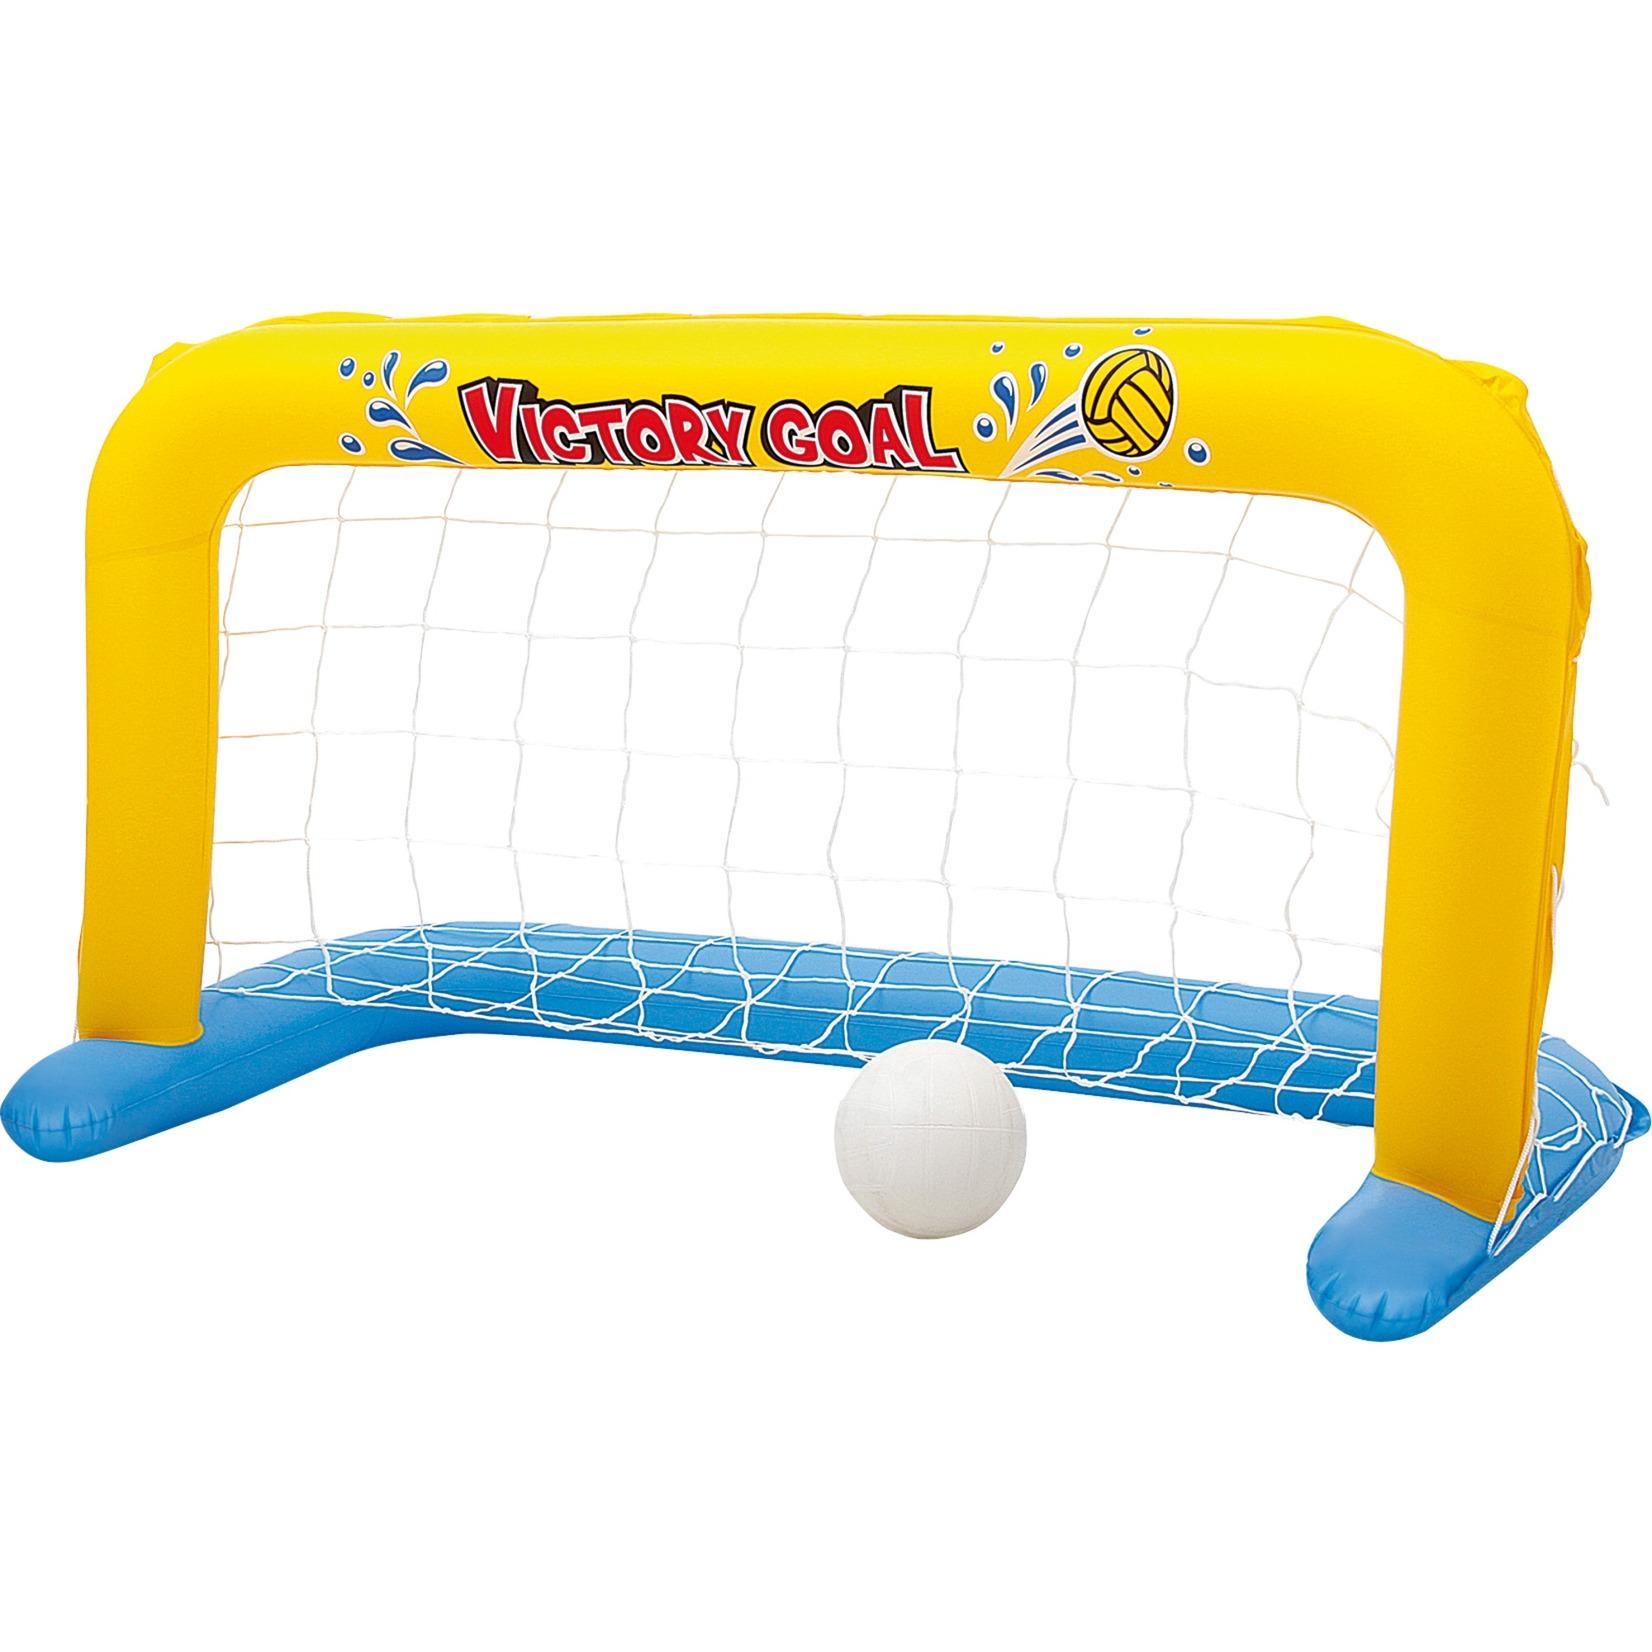 52123 juguete inflable, Juguetes de agua